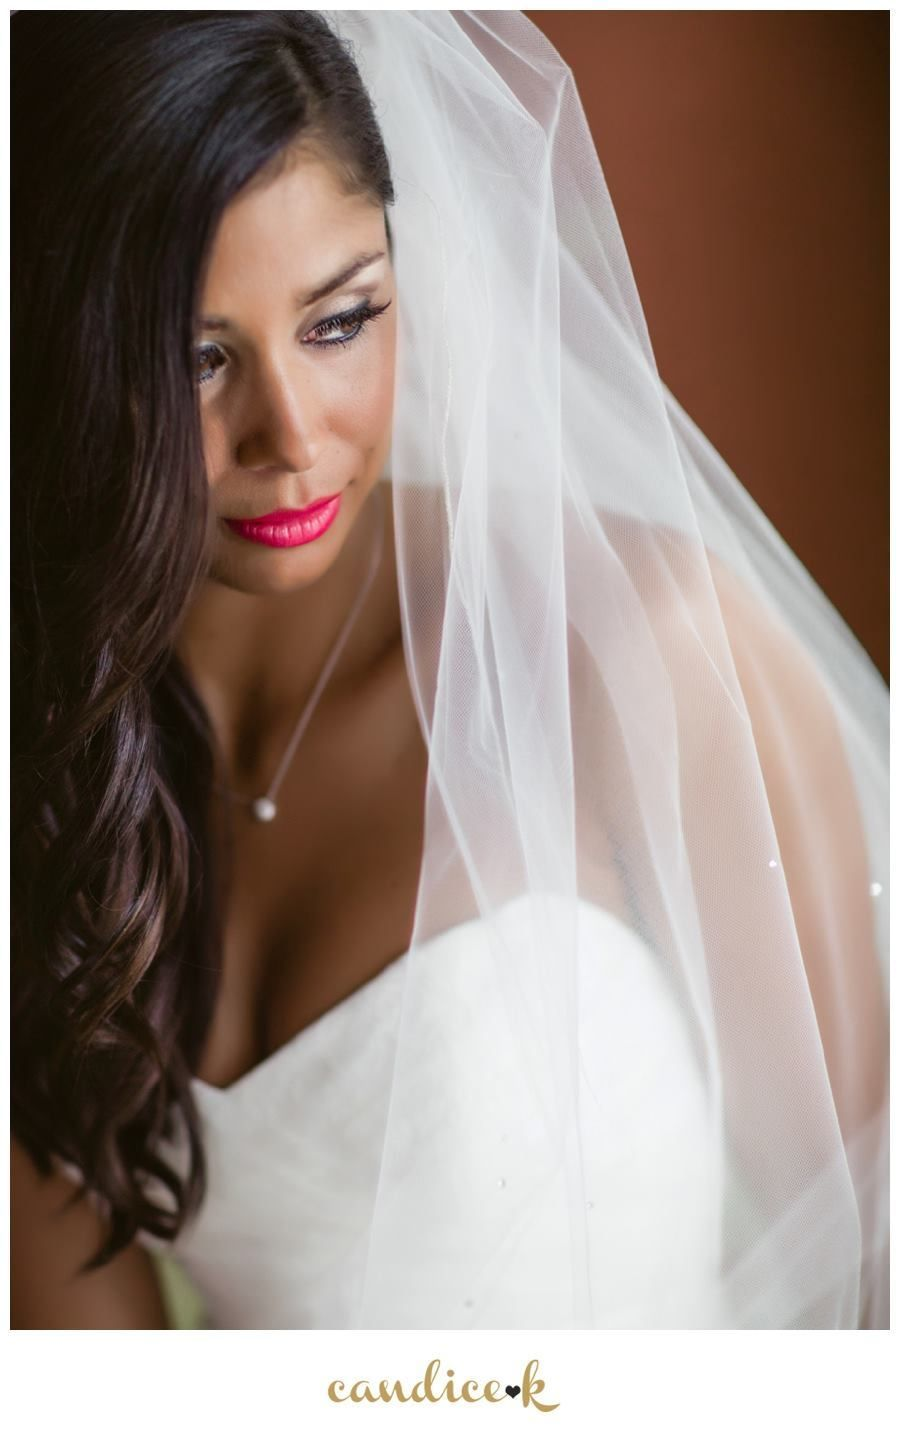 candice k photography -- make me blush destin hairstylist and